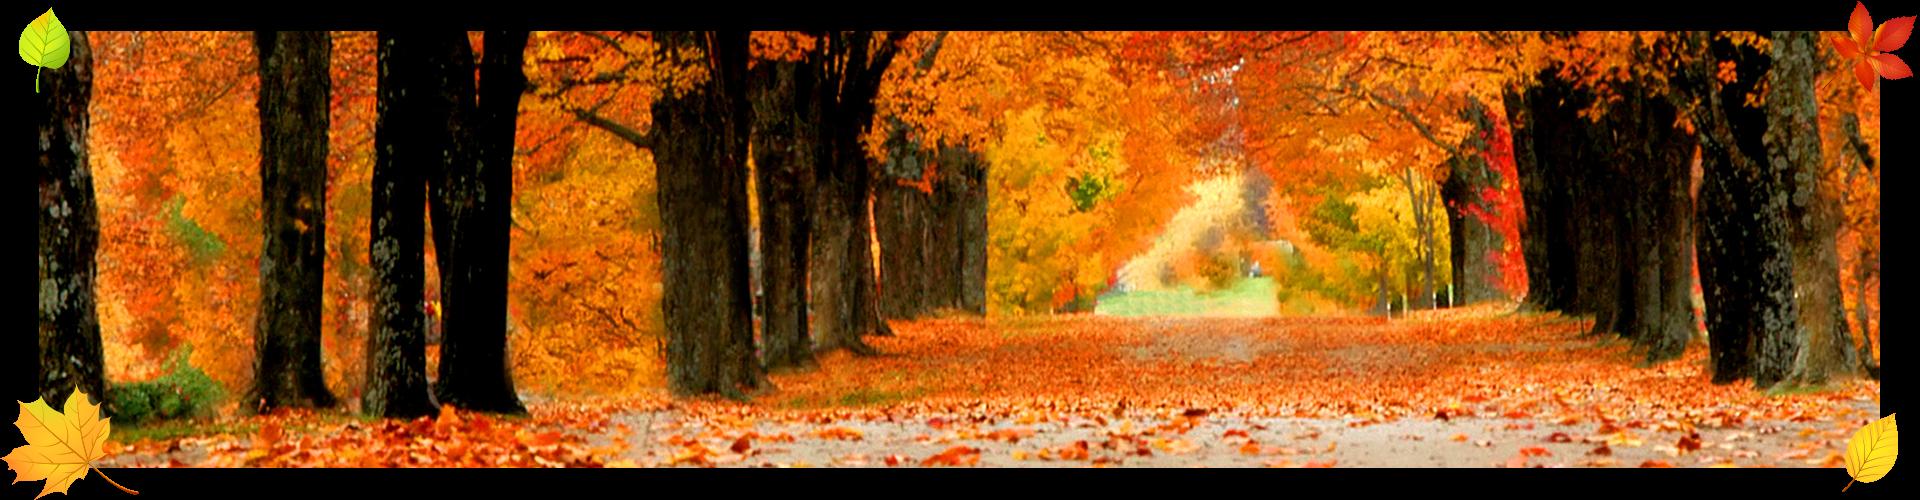 planning an rv michigan fall color tour lakeshore rv blog